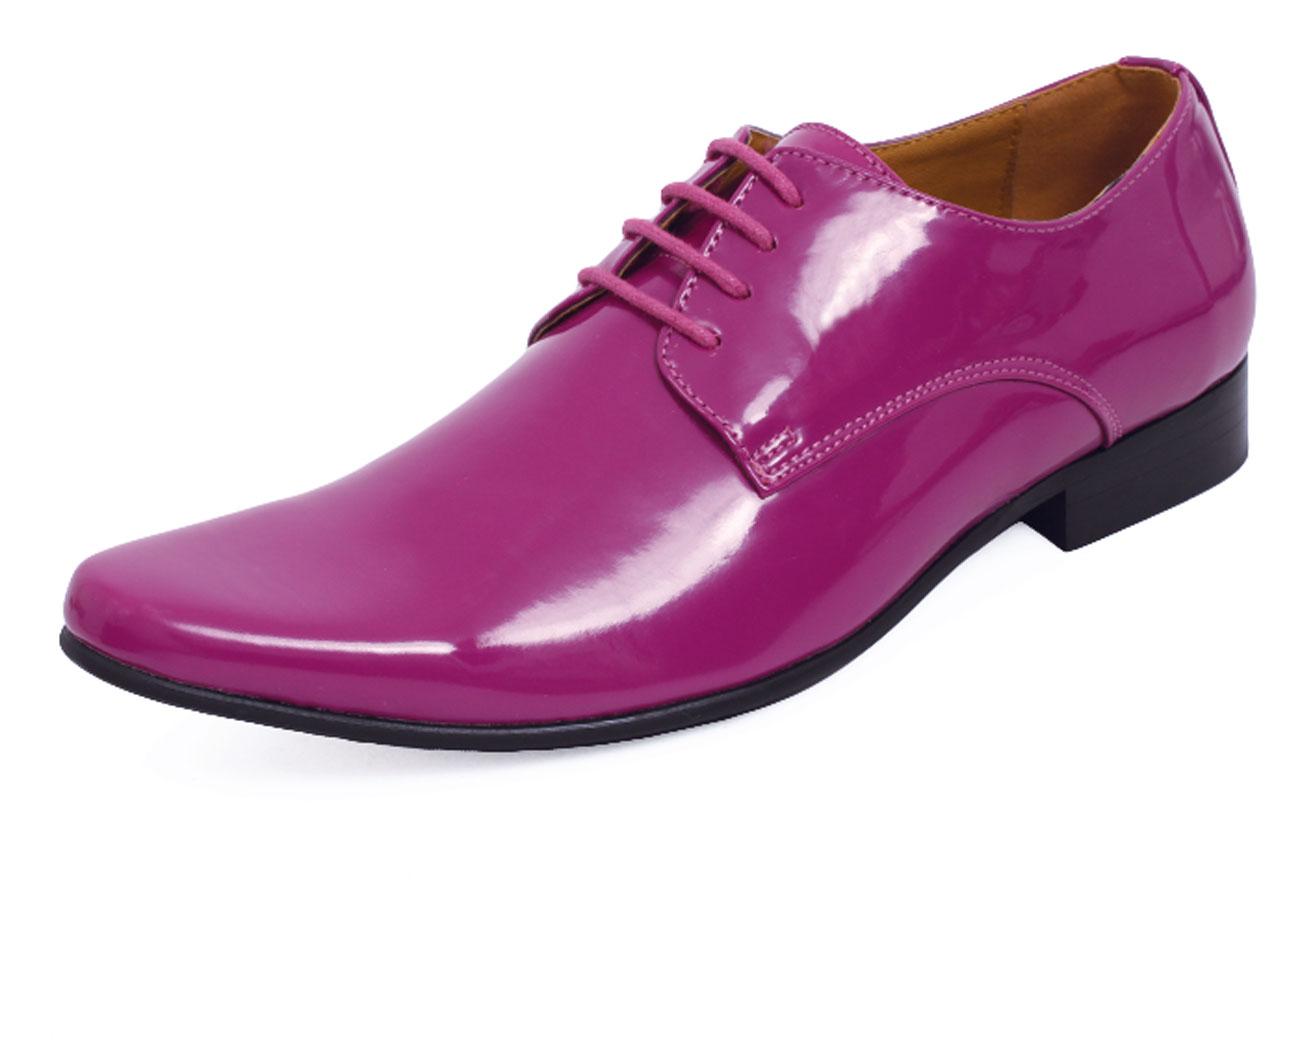 purple dress shoes mens near me